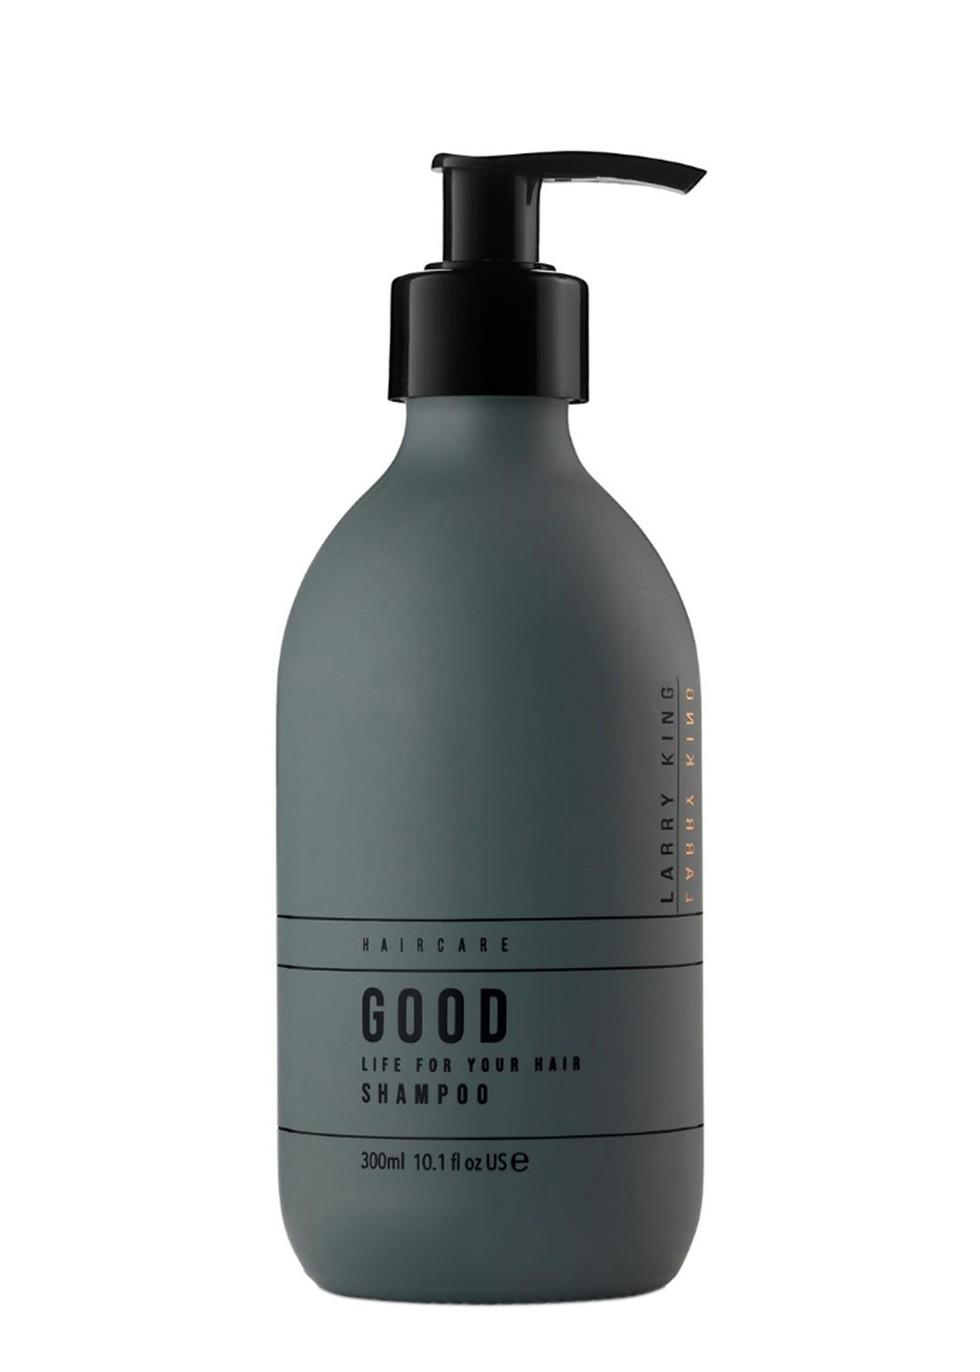 Larry King Good Life Shampoo